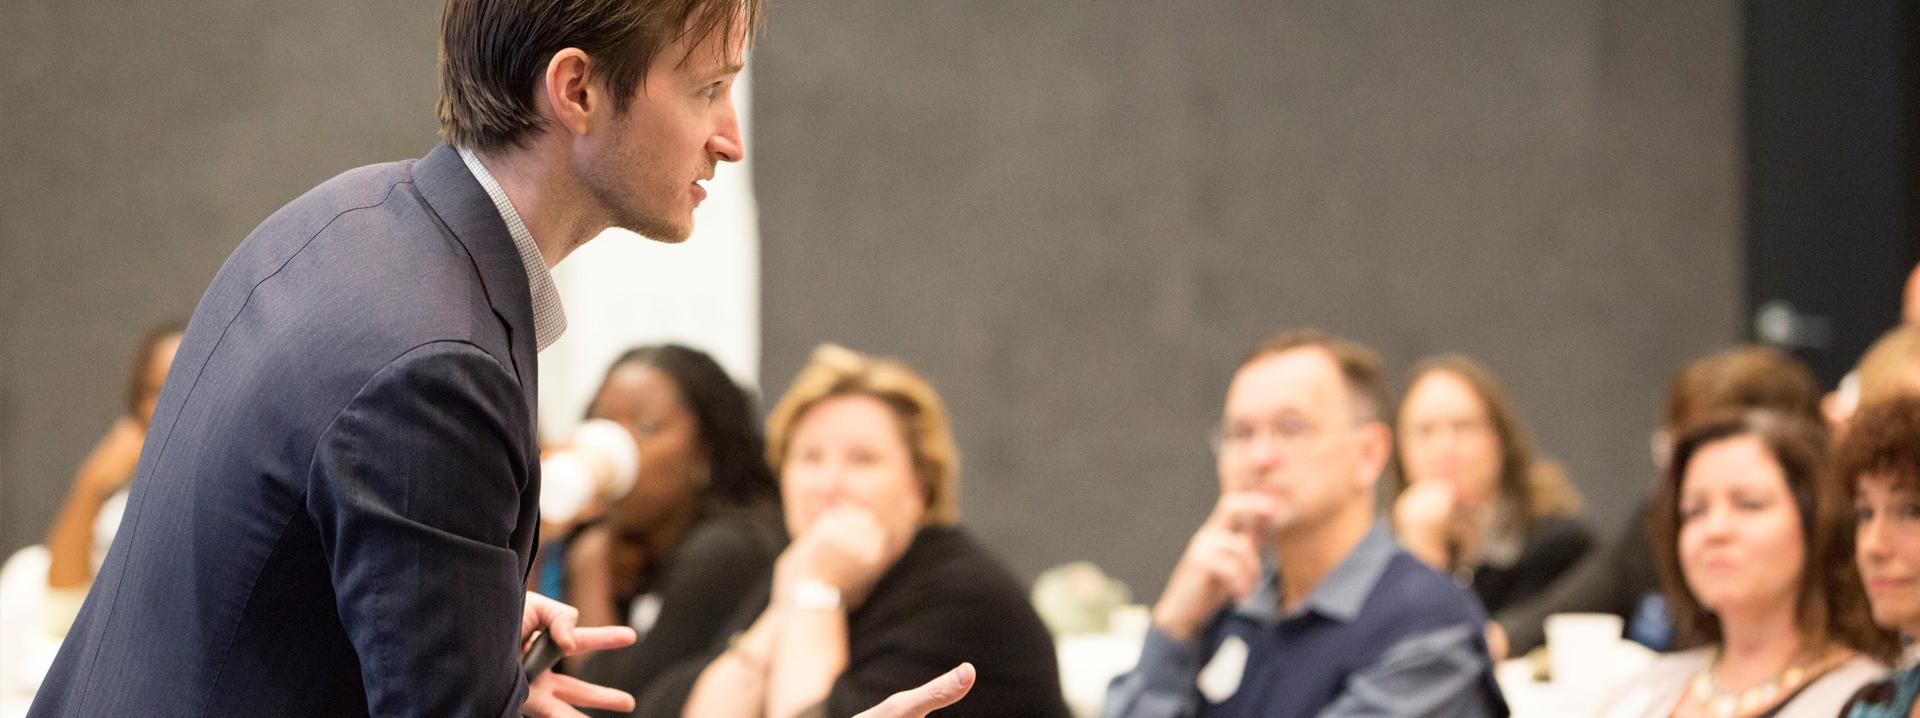 2-leadership-decision-making-workshop-humor-that-works